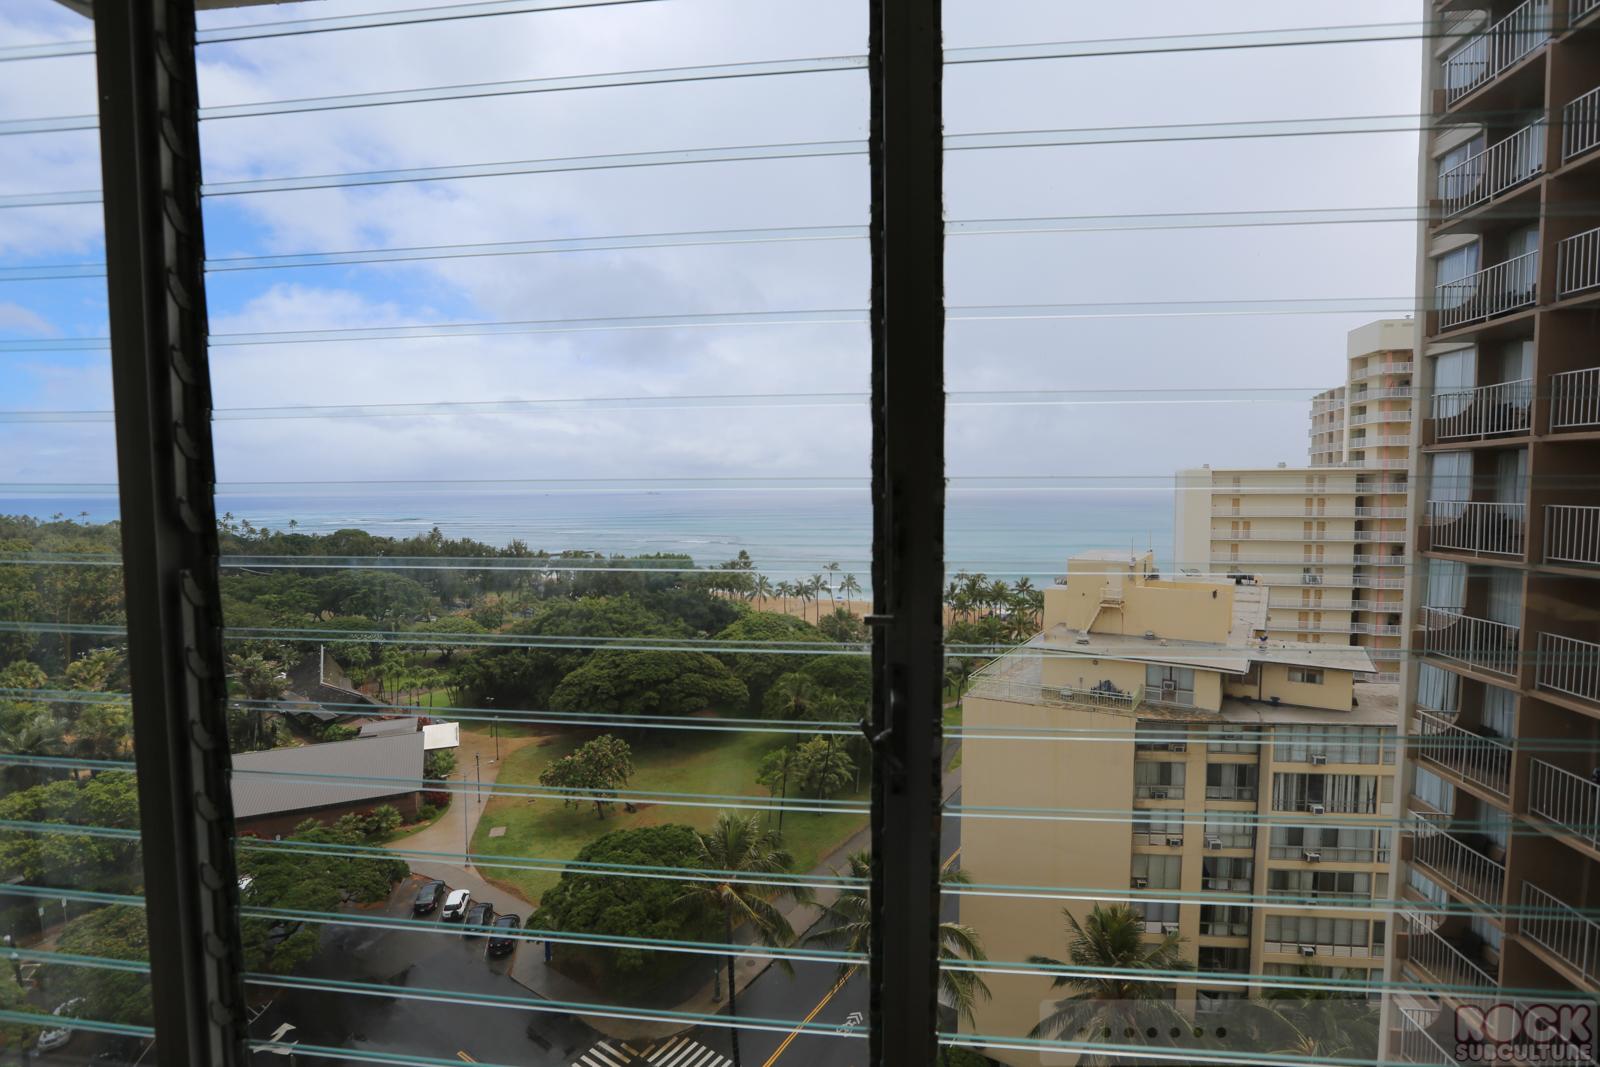 Queen-Kapiolani-Resort-Hotel-Review-Honolulu-Waikiki-Oahu- 9a02107bc94